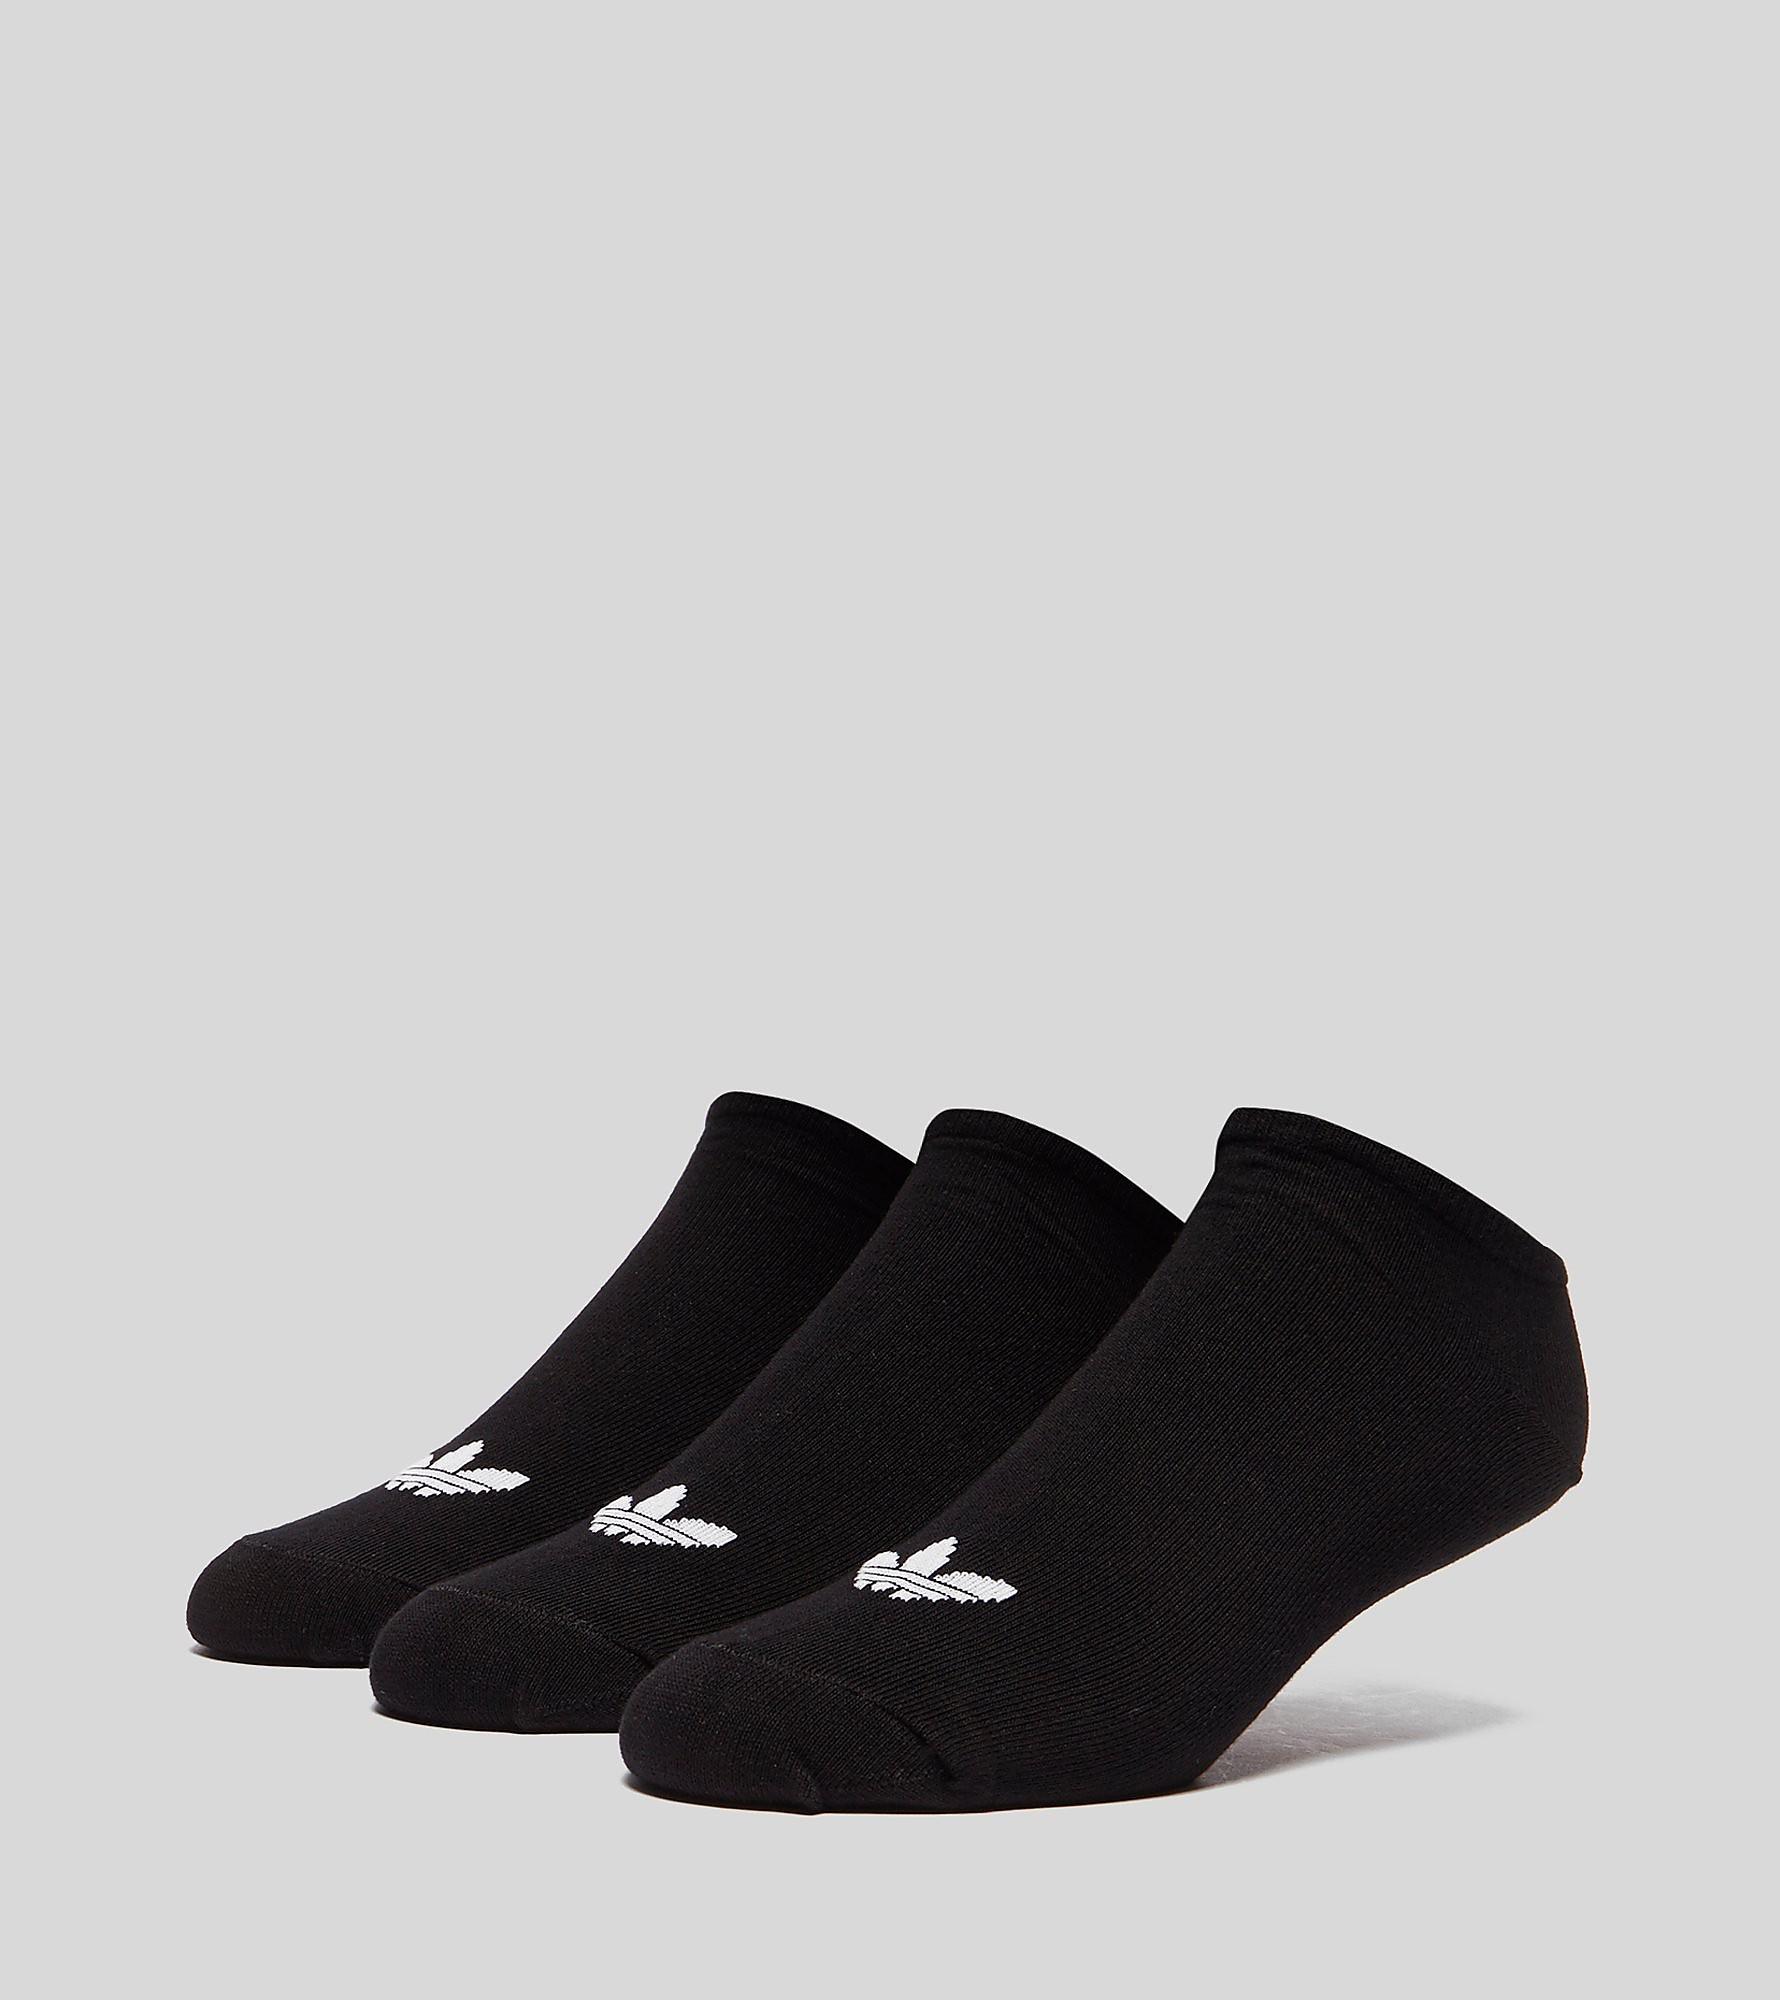 adidas Originals Chaussettes Trefoil Liner  - 3